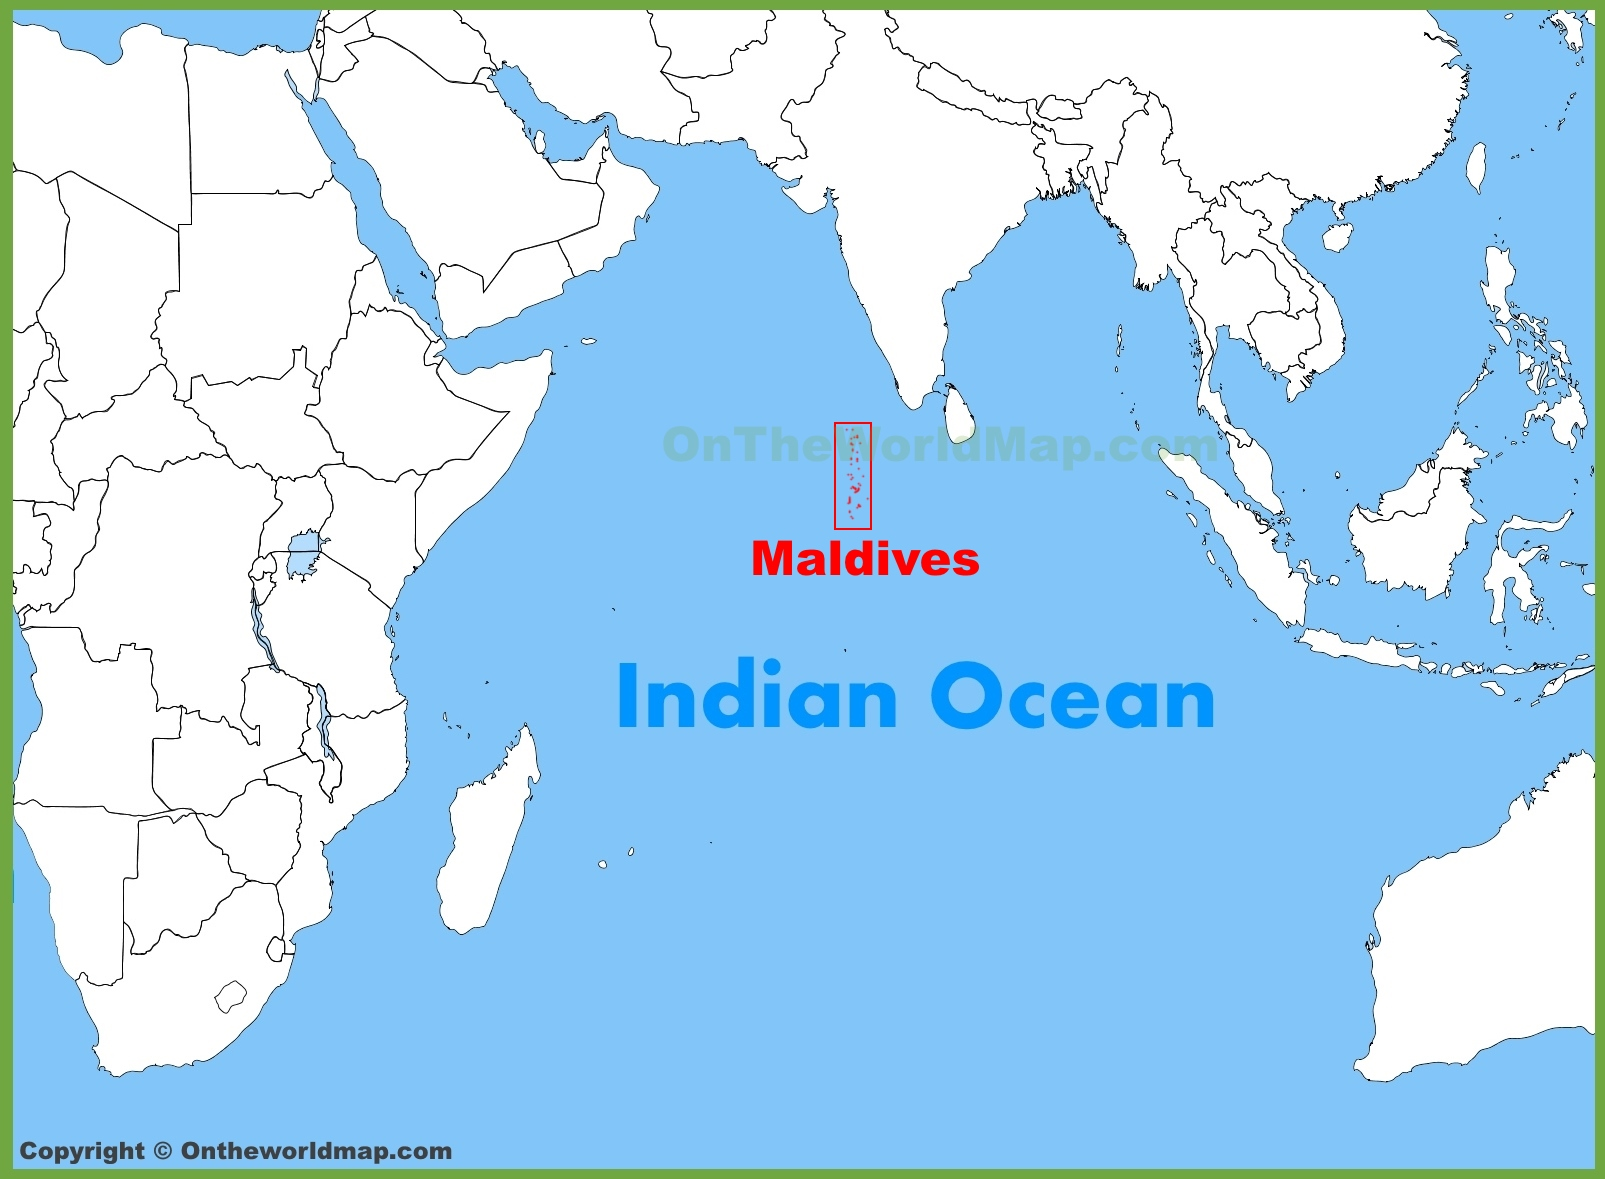 Maldives Location Map Maldives location on the Indian Ocean map Maldives Location Map